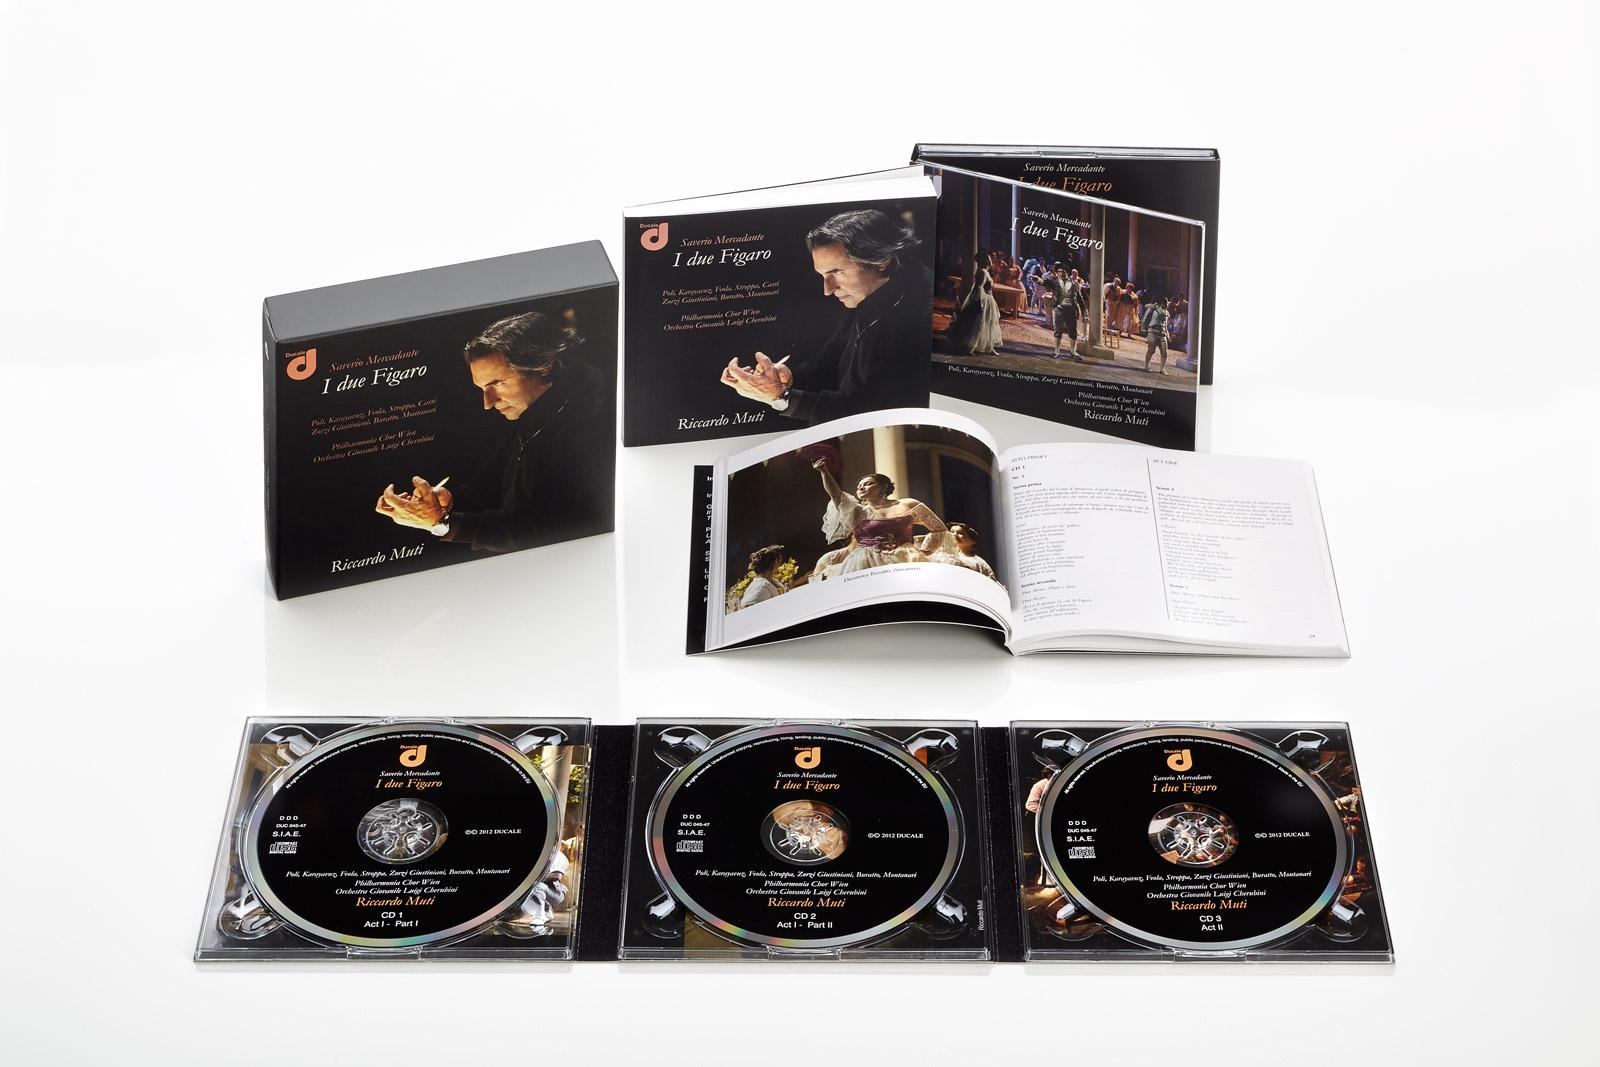 FEST BAIXAR ORDINARIOS CD